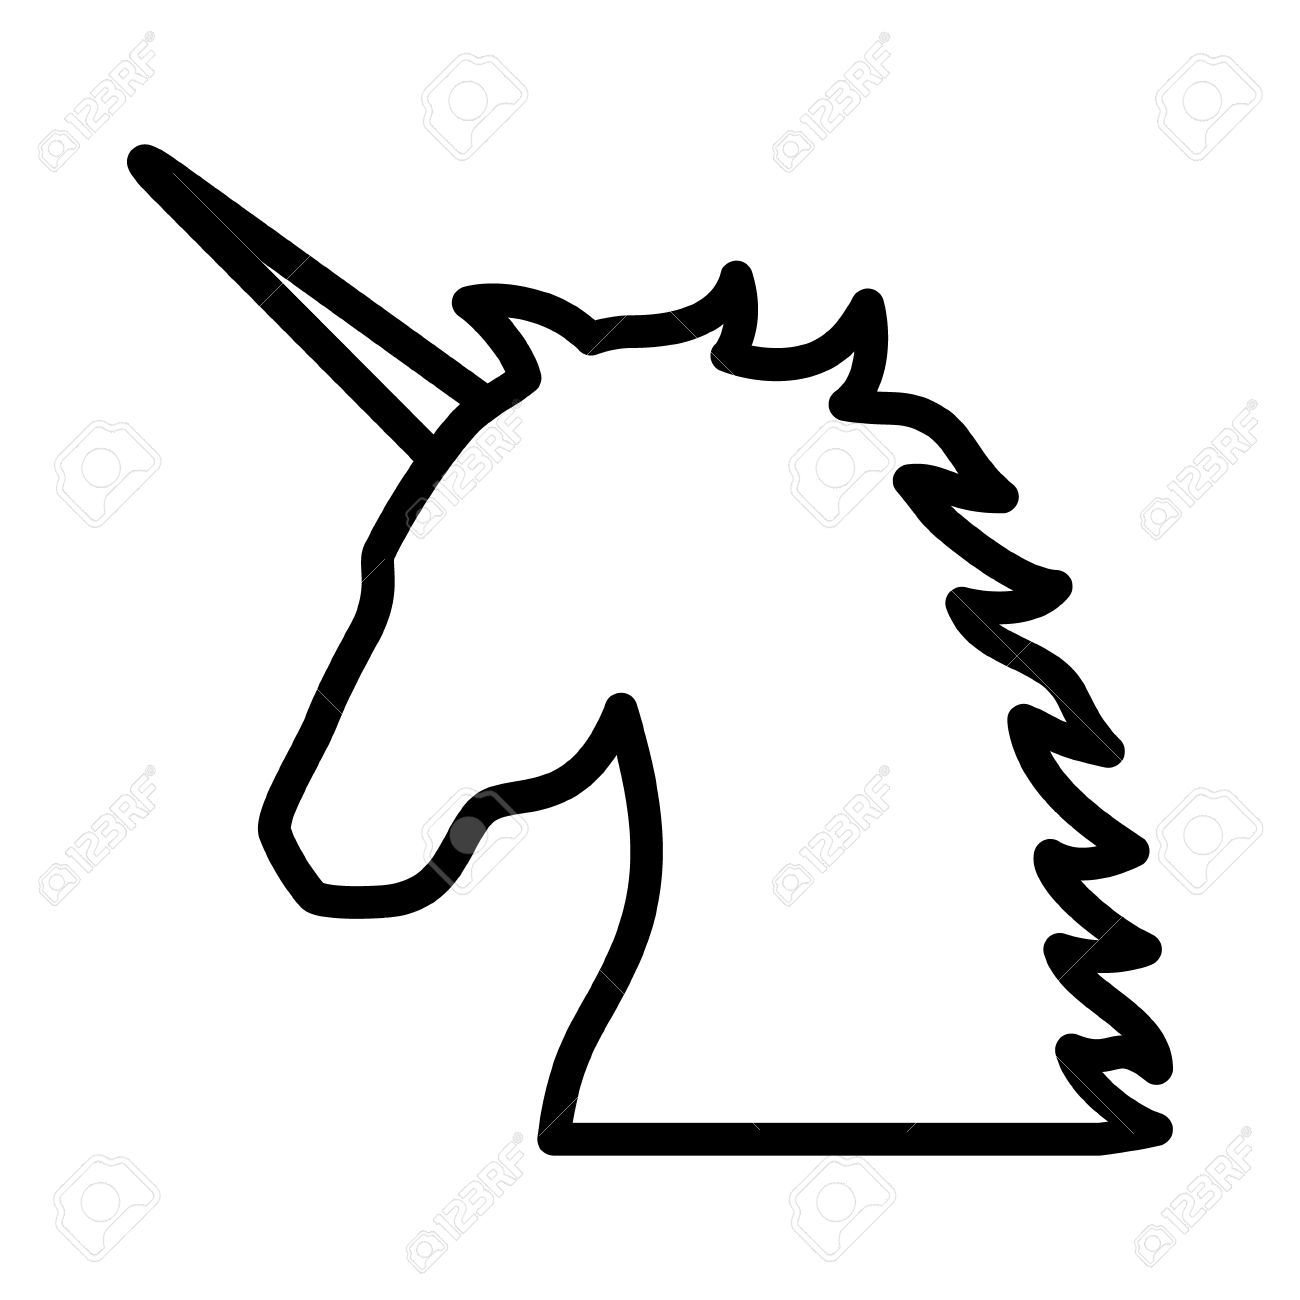 Line Art App : Unicorn legendary mythical creature line art icon for